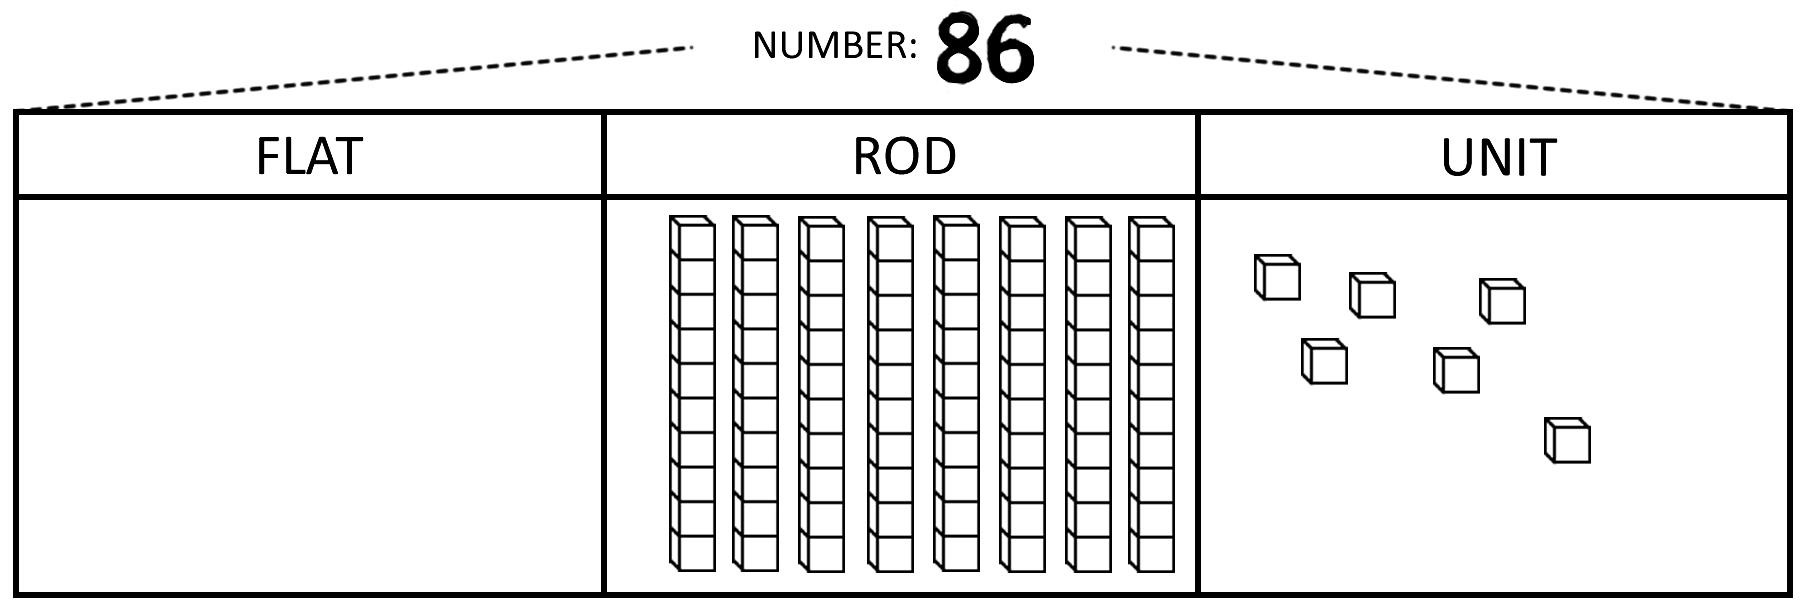 worksheet Place Value Blocks basically base ten discovering place value meaning using basicallybaseten pic